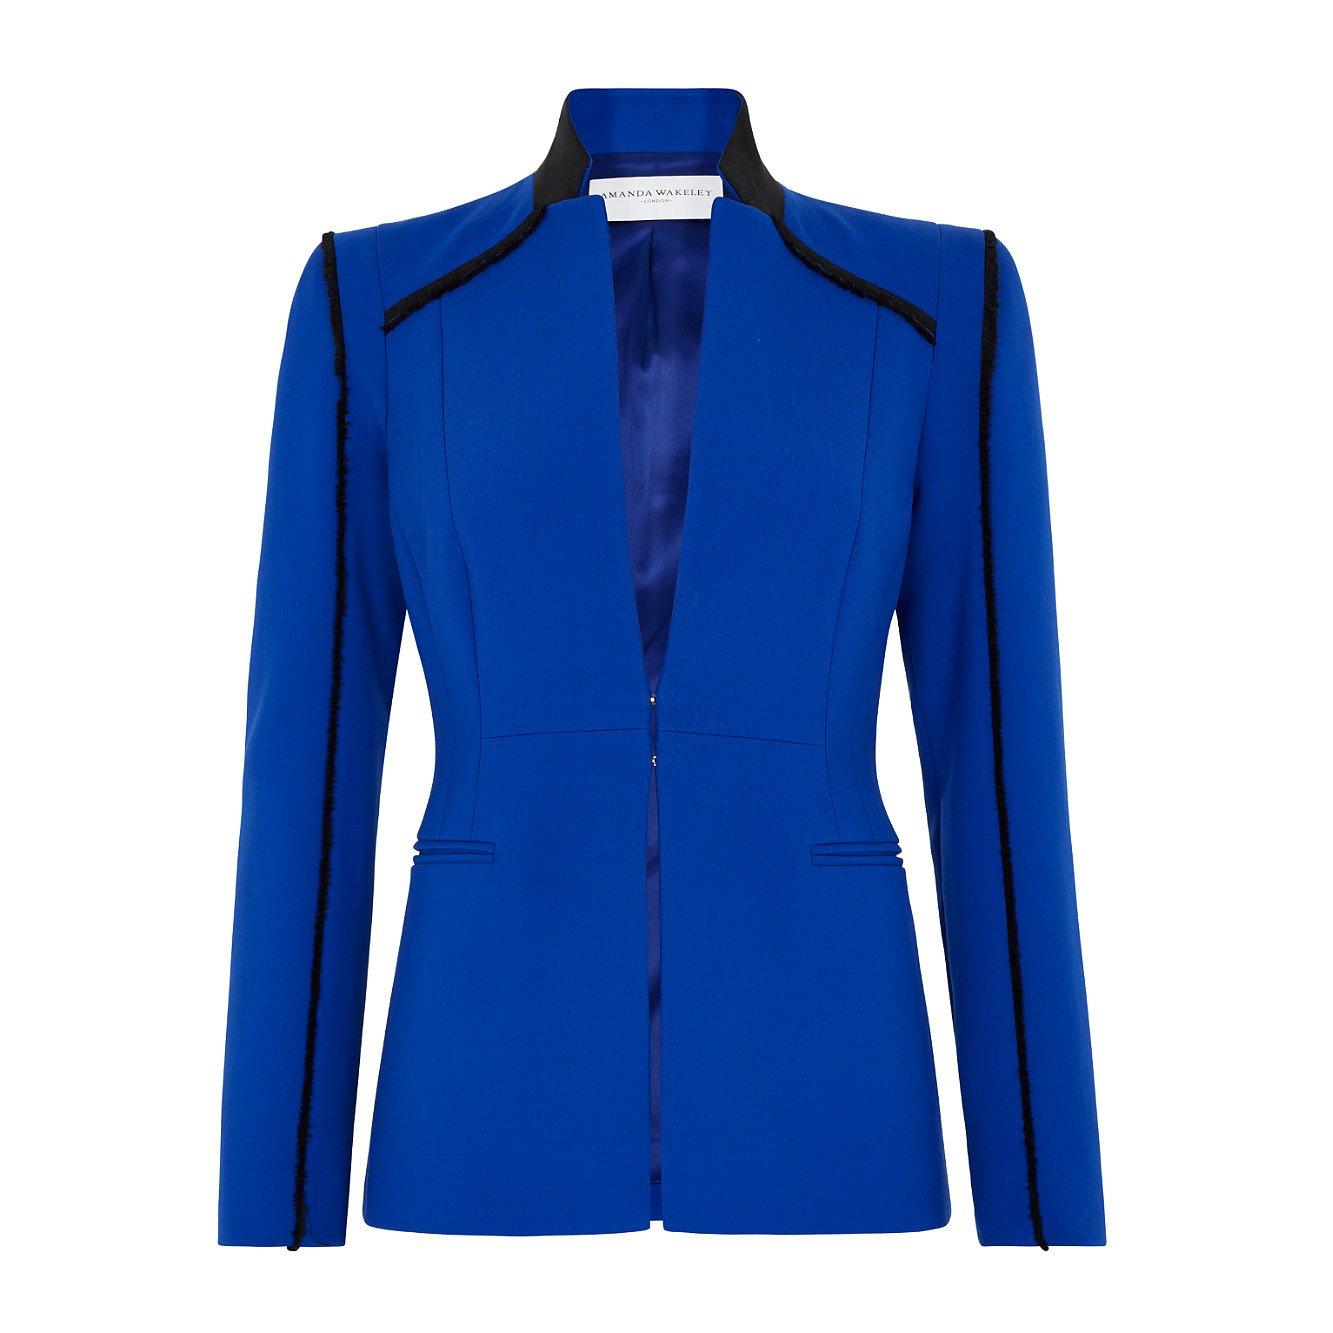 Amanda Wakeley Sculpted Slim Fitting Jacket